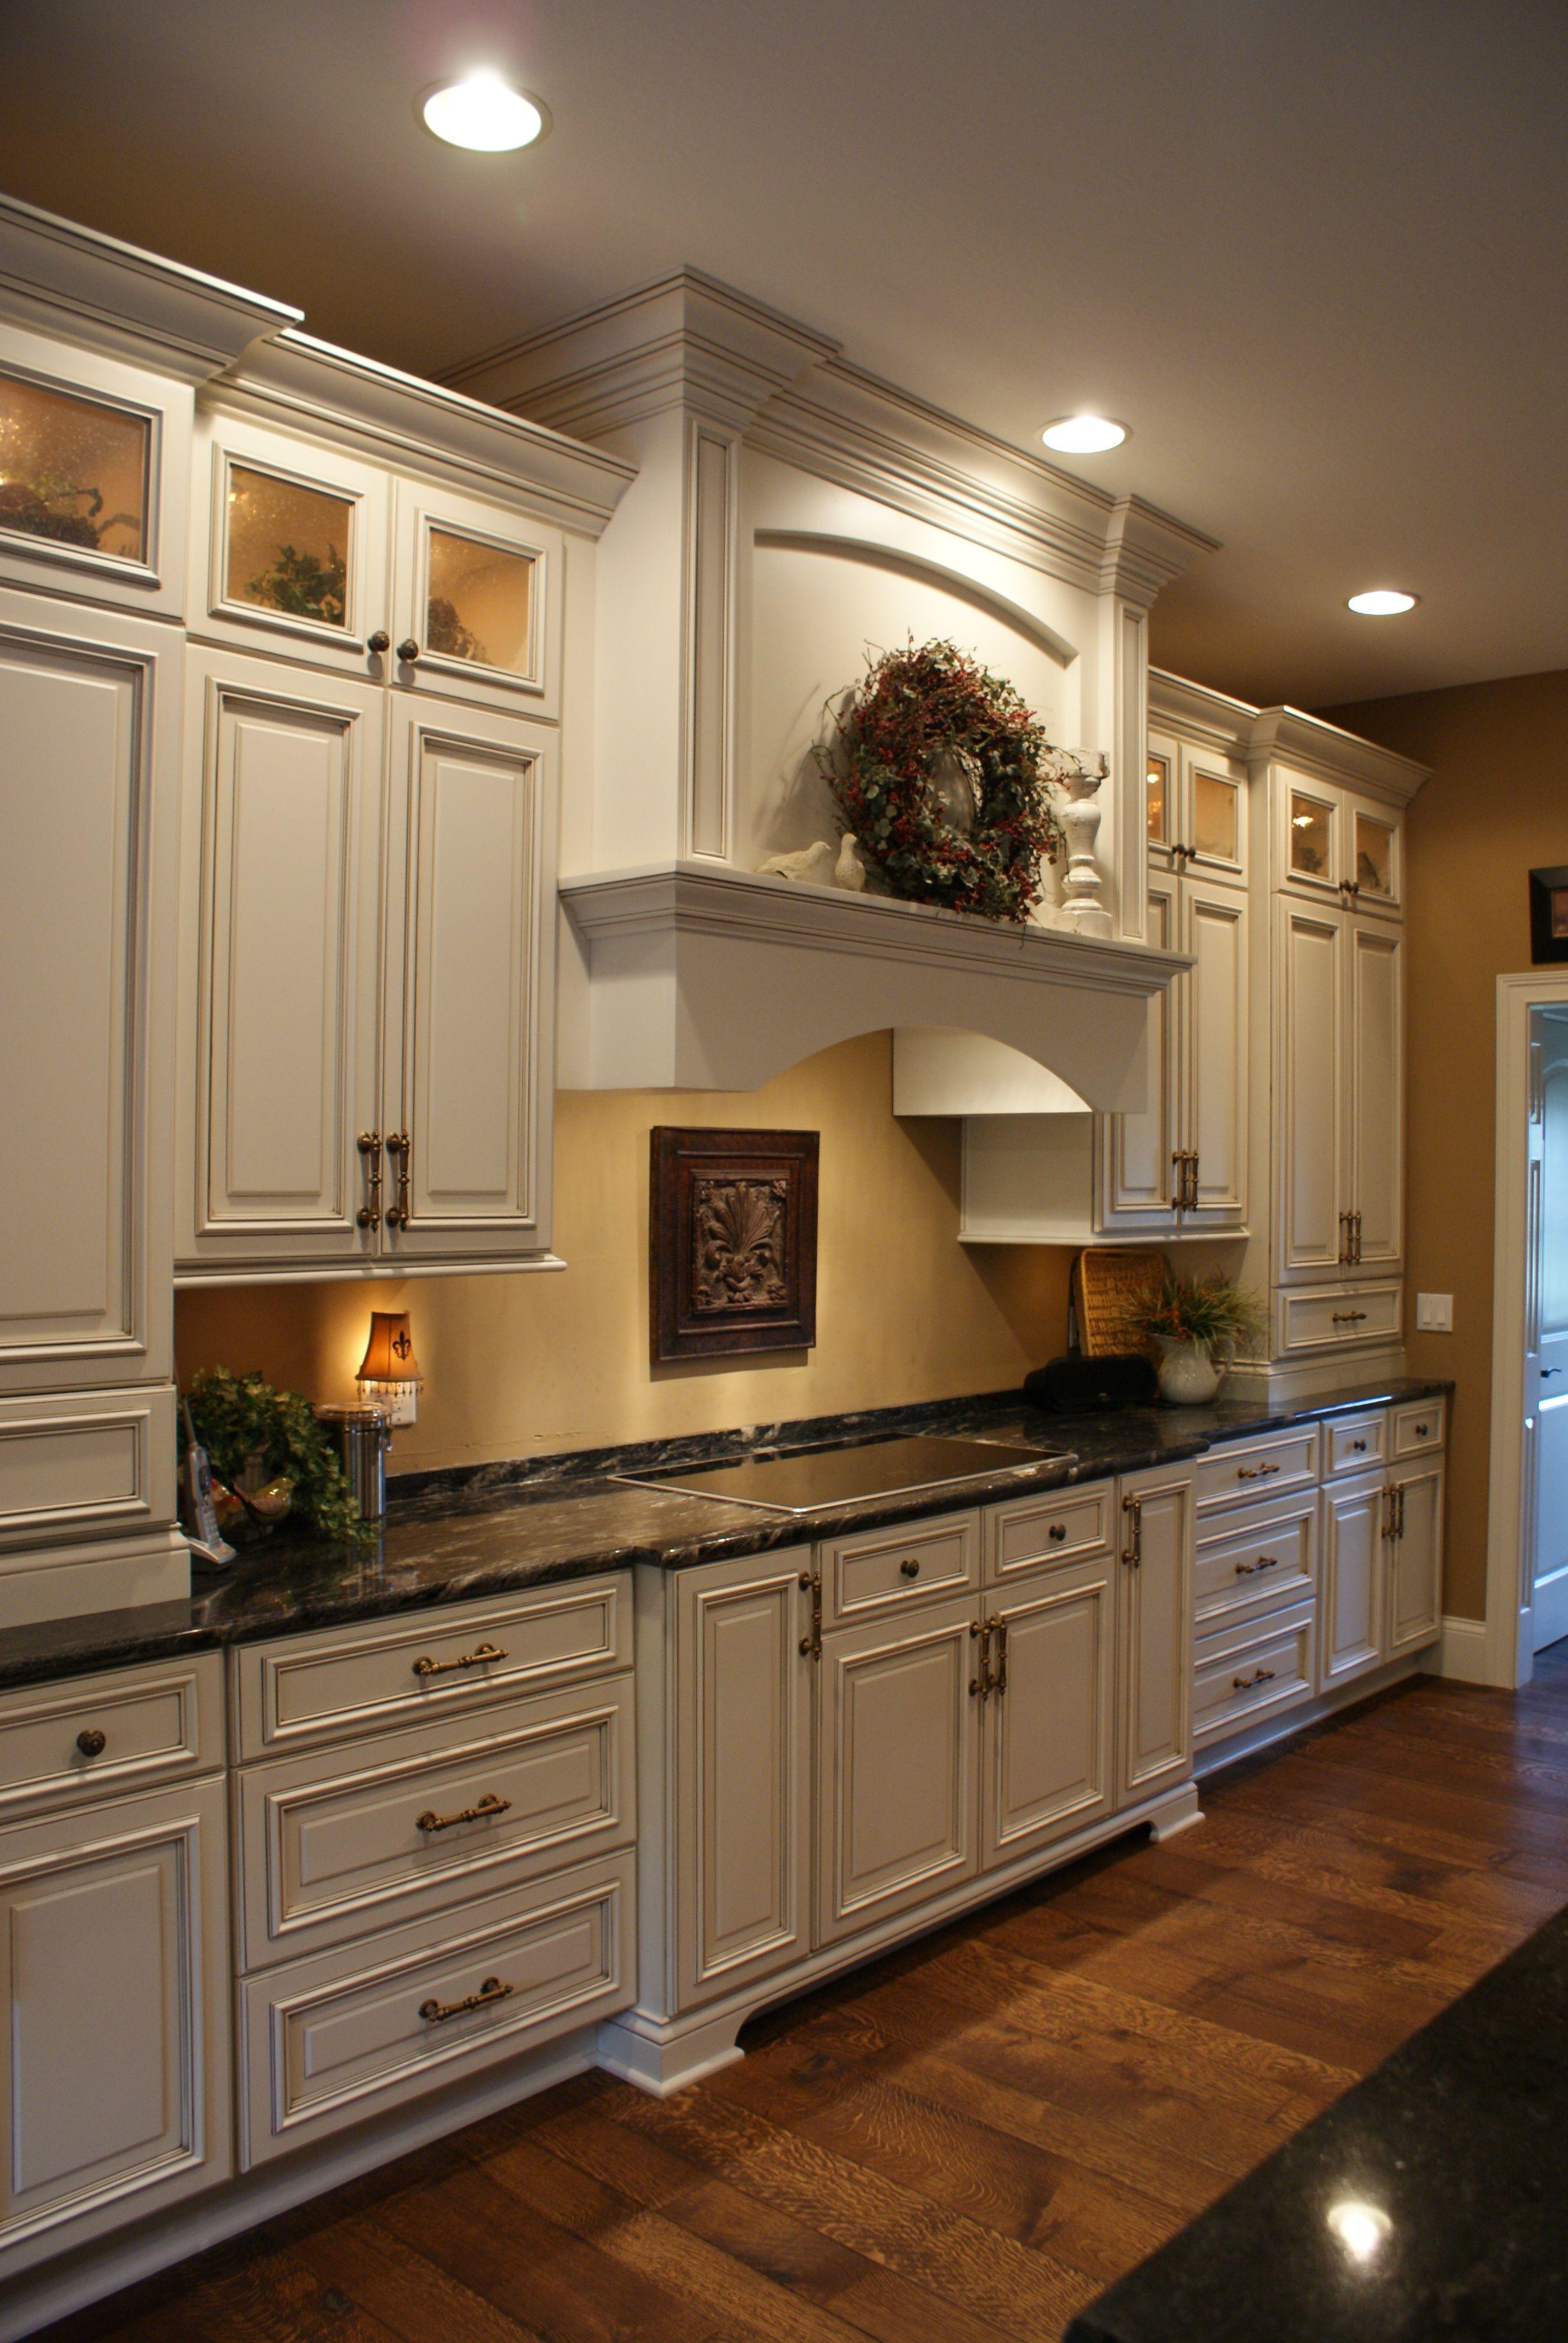 Carmel Kitchen Specialists Inc Designer Julie King Kitchen